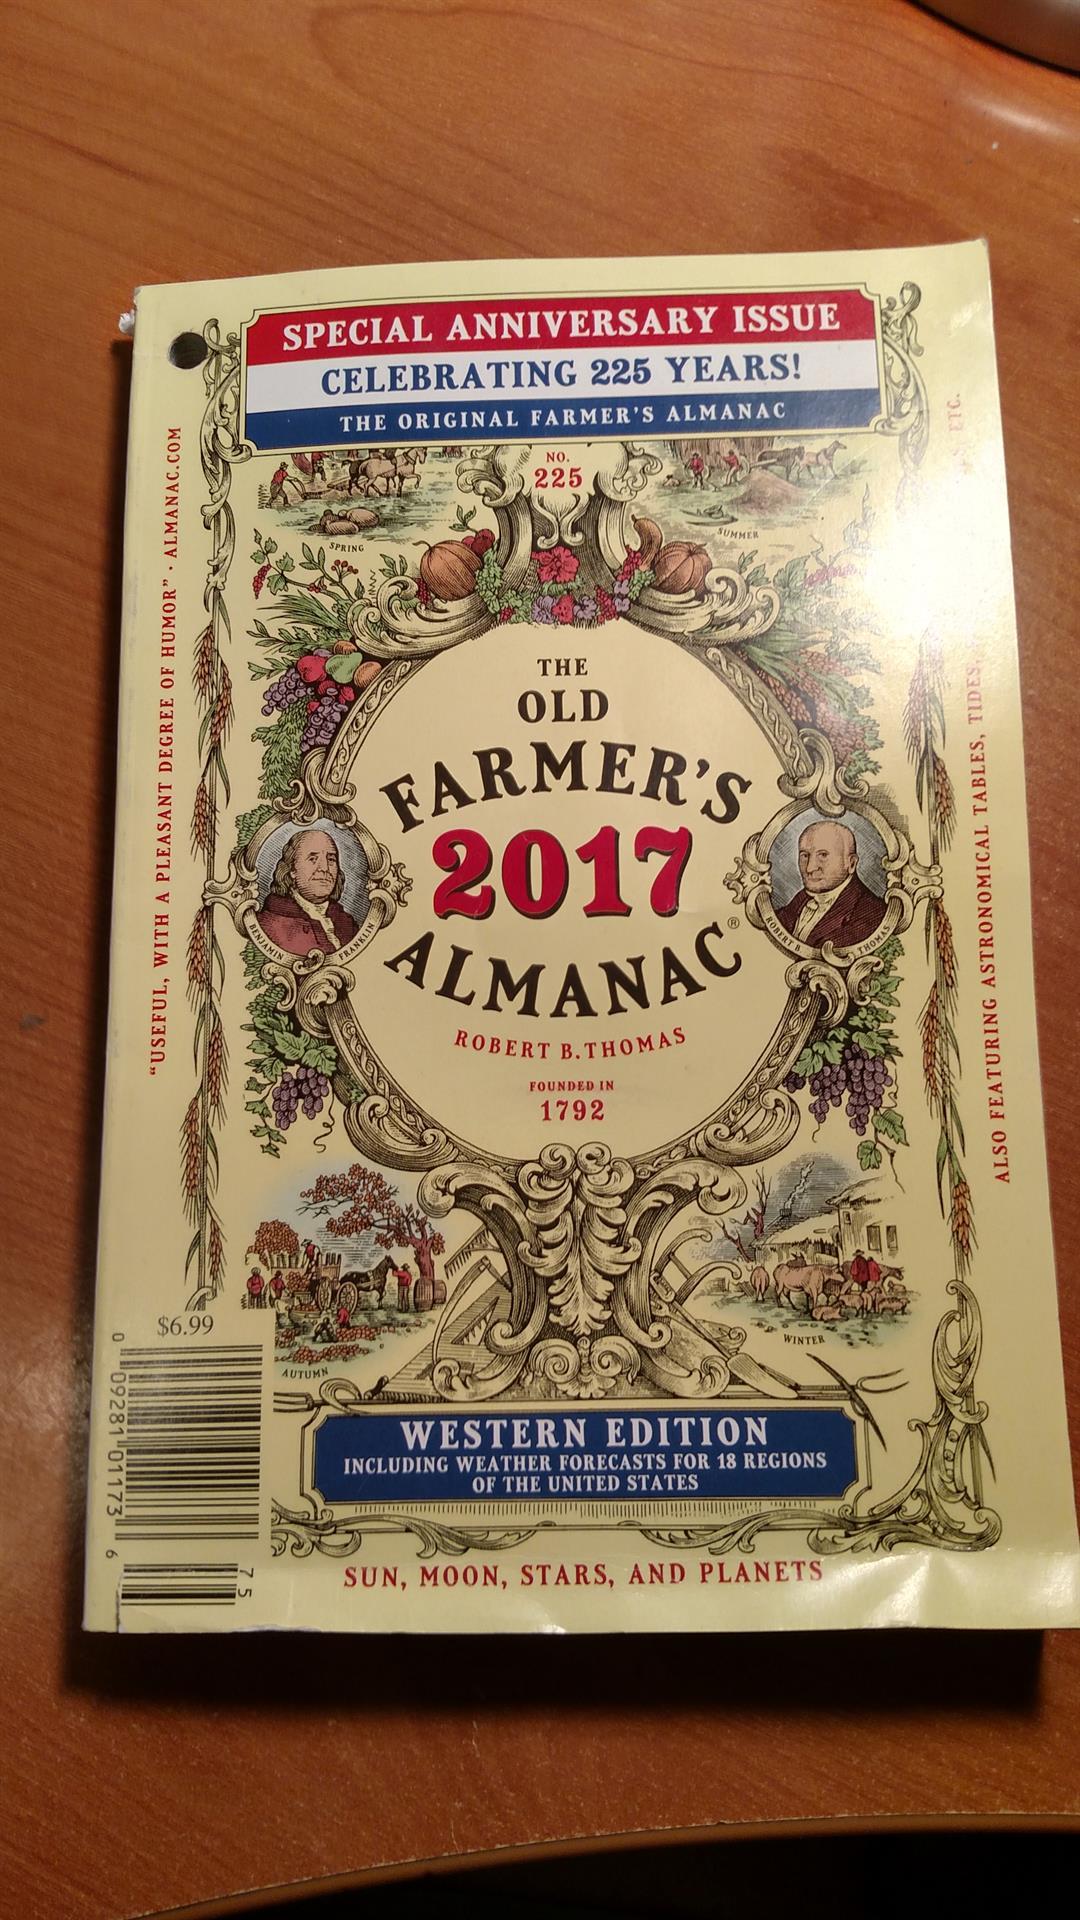 The 225th Anniversary Old Farmer's Almanac. (Source: Royal Norman)